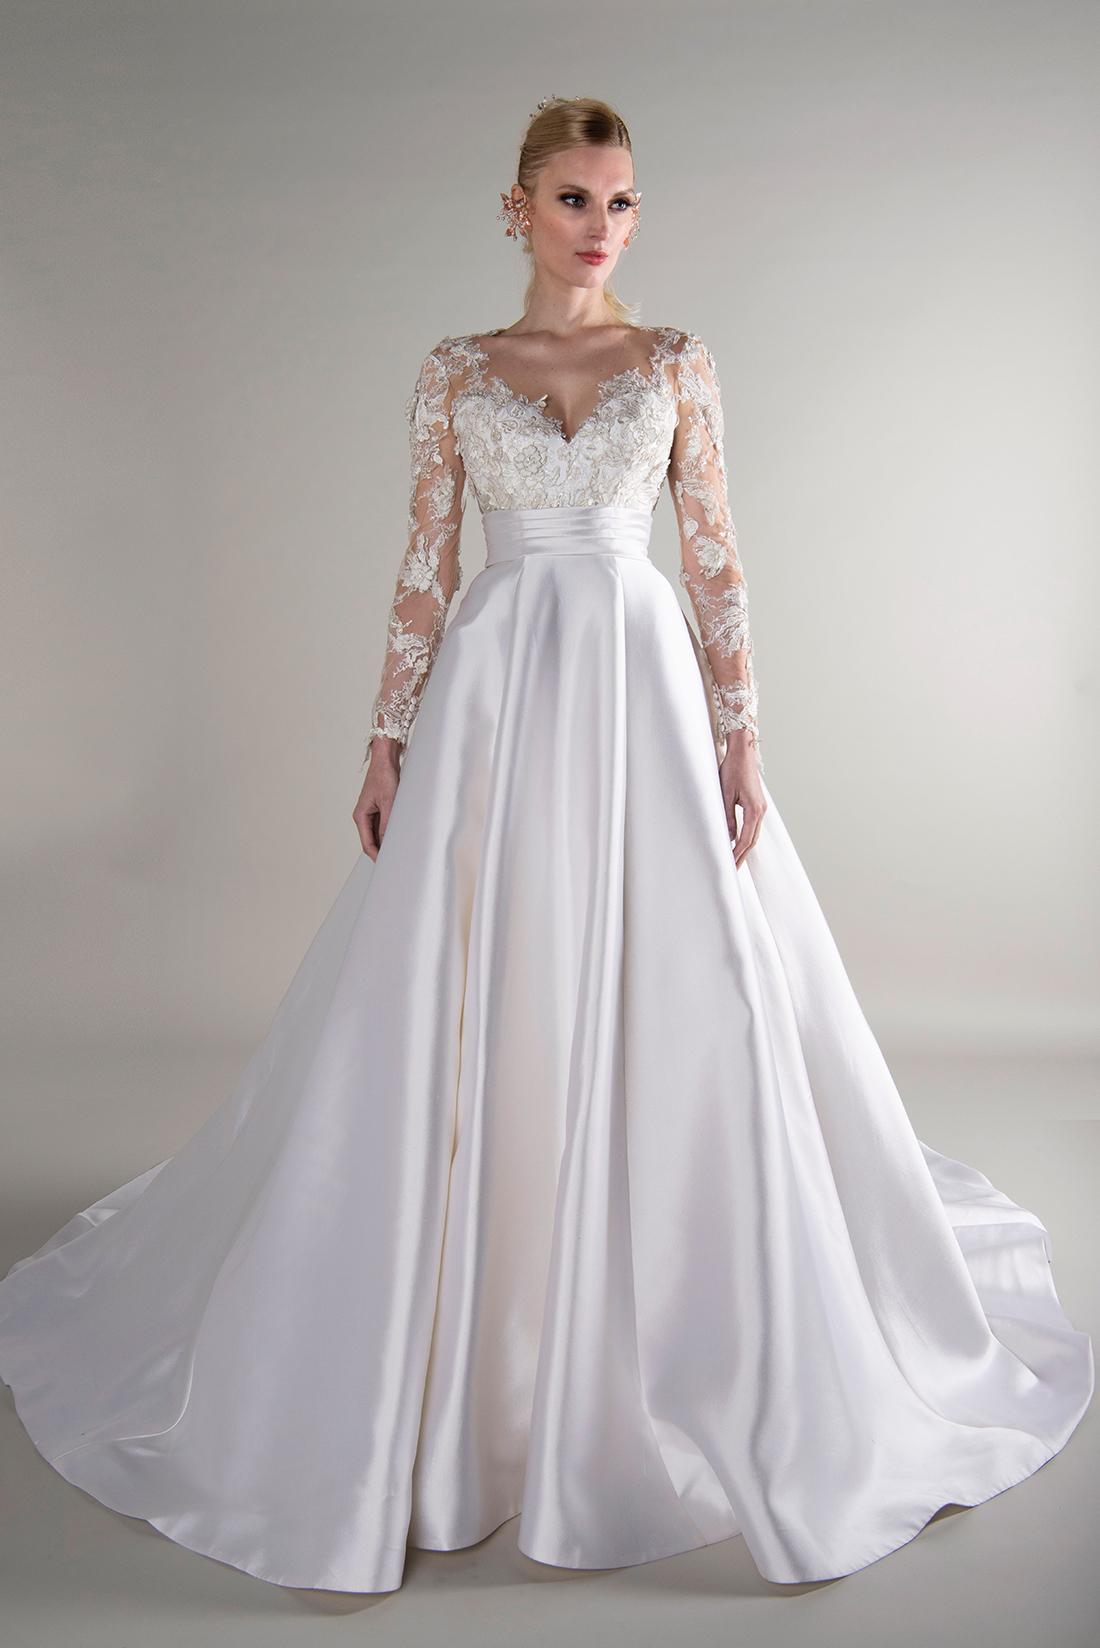 yumi katsura fall 2019 ball gown sweetheart illusion long sleeves sheer floral applique